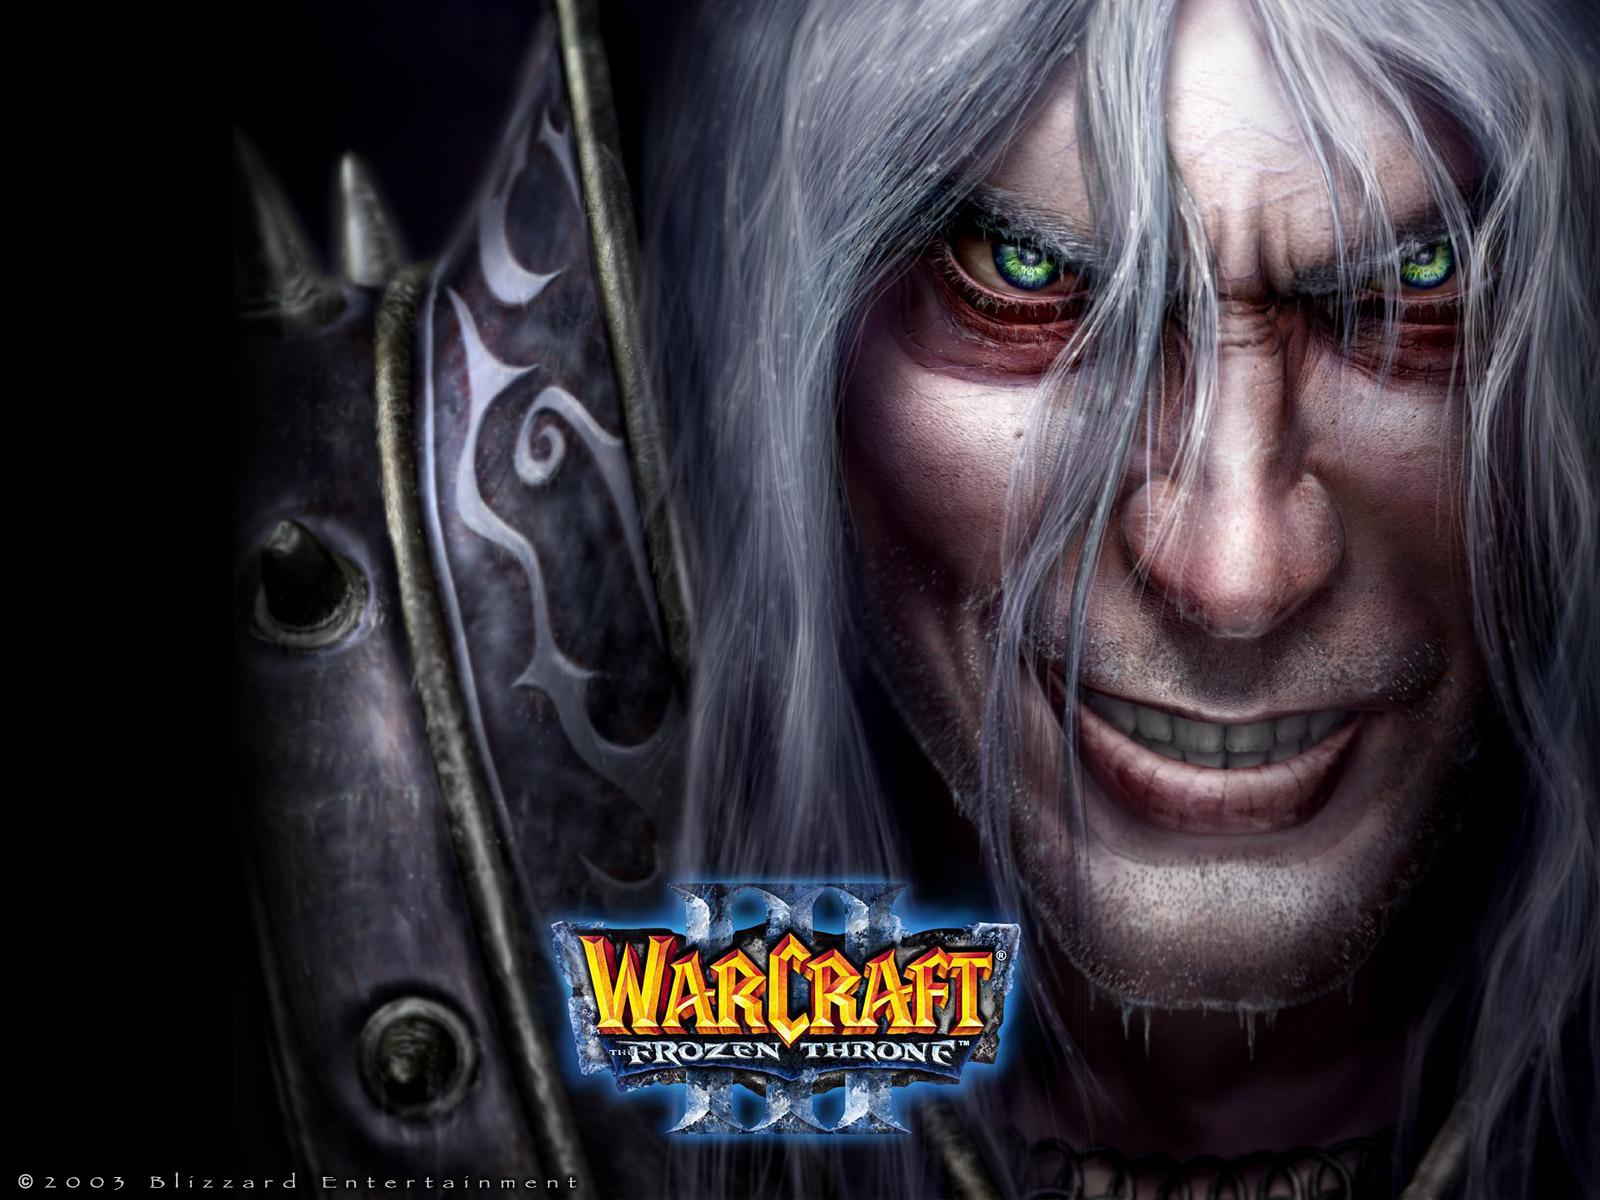 Warcraft 3 Remaster oder Warcraft 4?